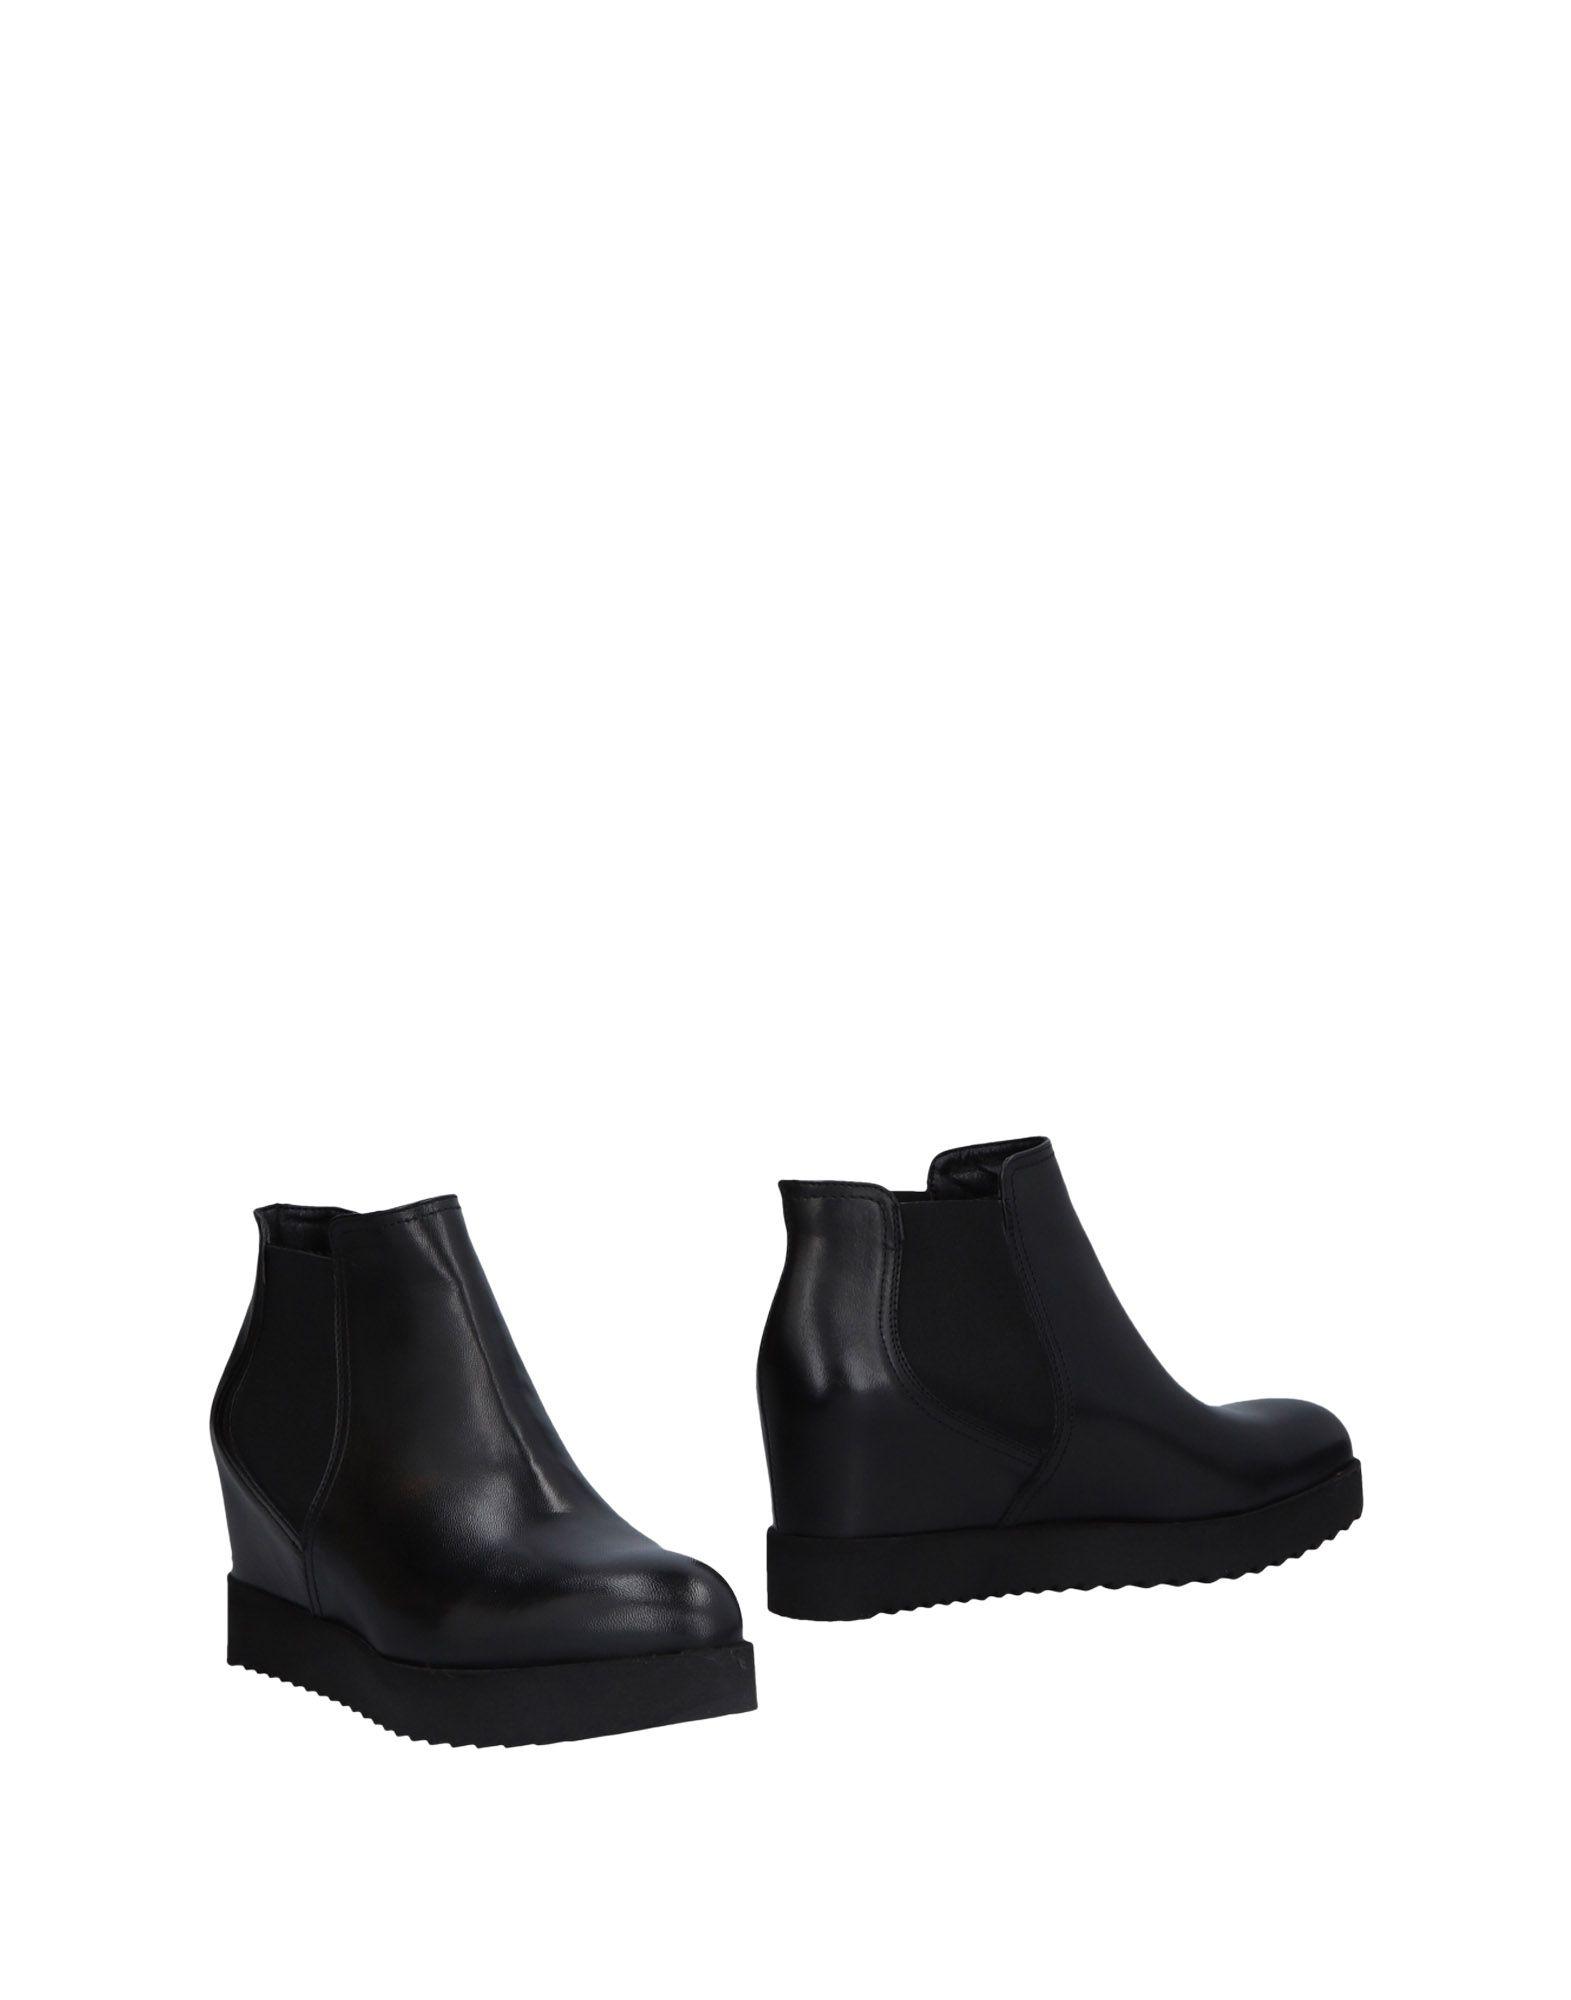 Formentini Chelsea Boots Damen  11478981NC Gute Qualität beliebte Schuhe